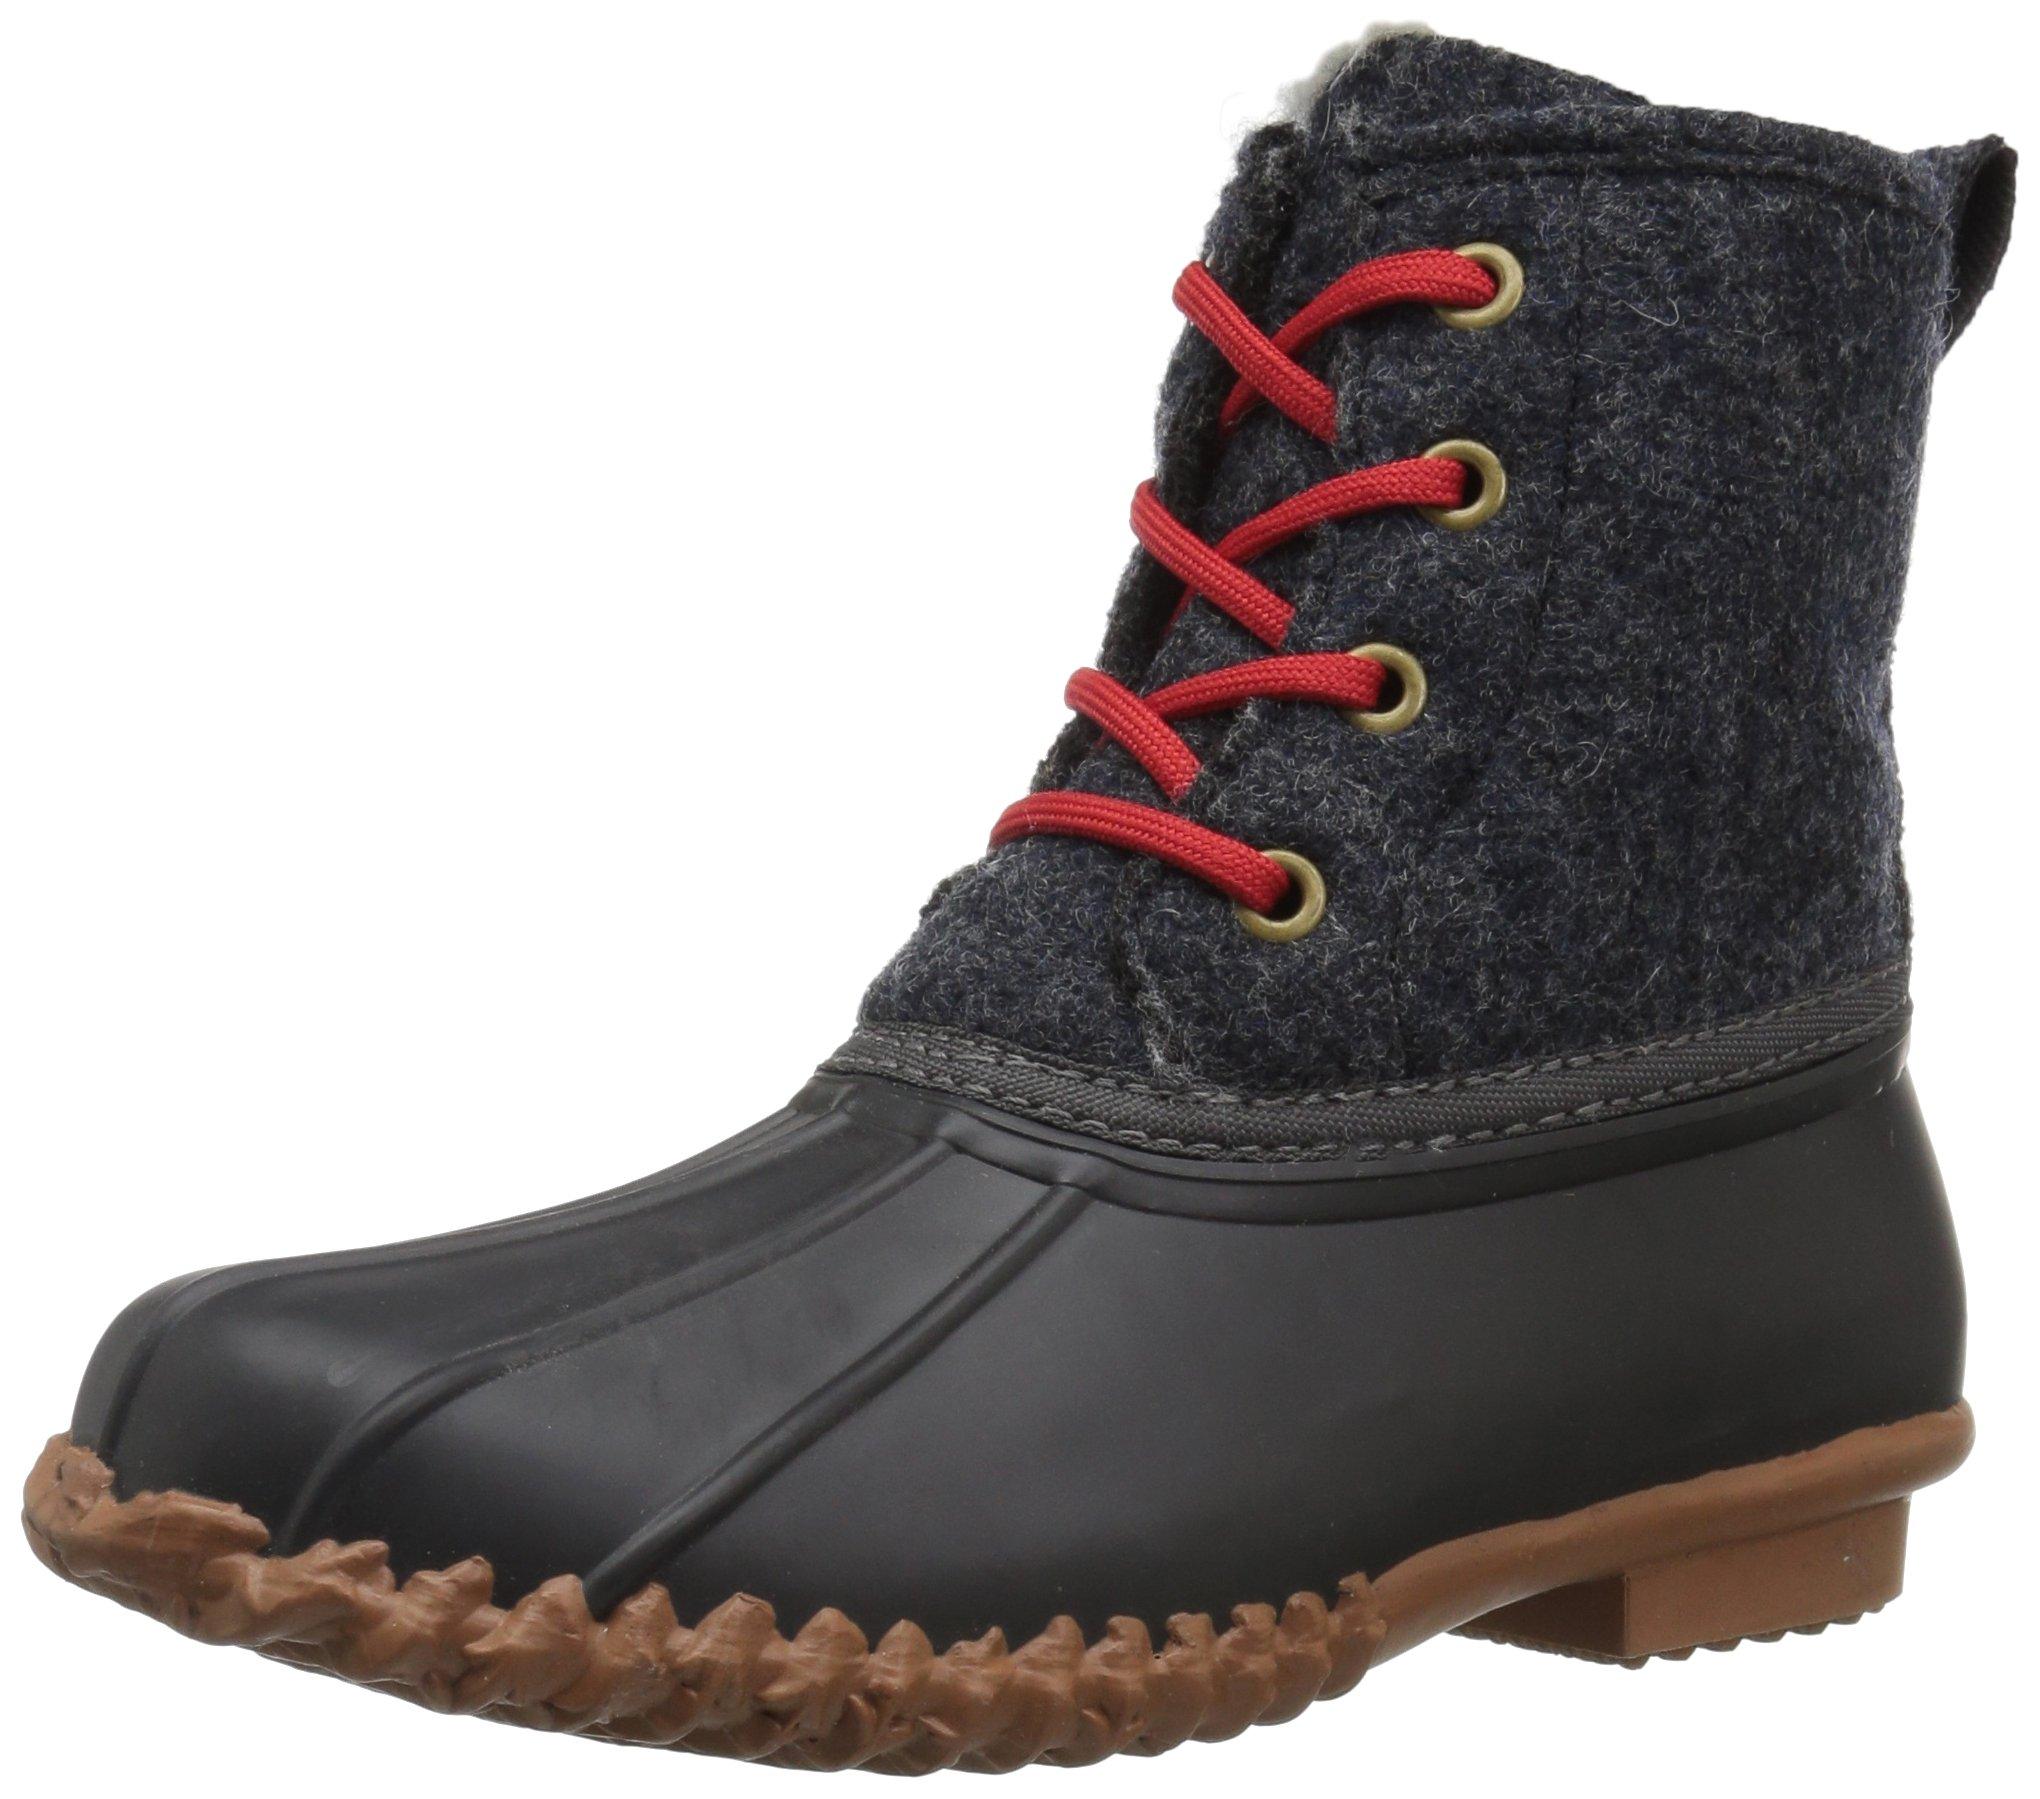 206 Collective Women's Rainier Duck Rain Boot, Black/Gray, 8 B US